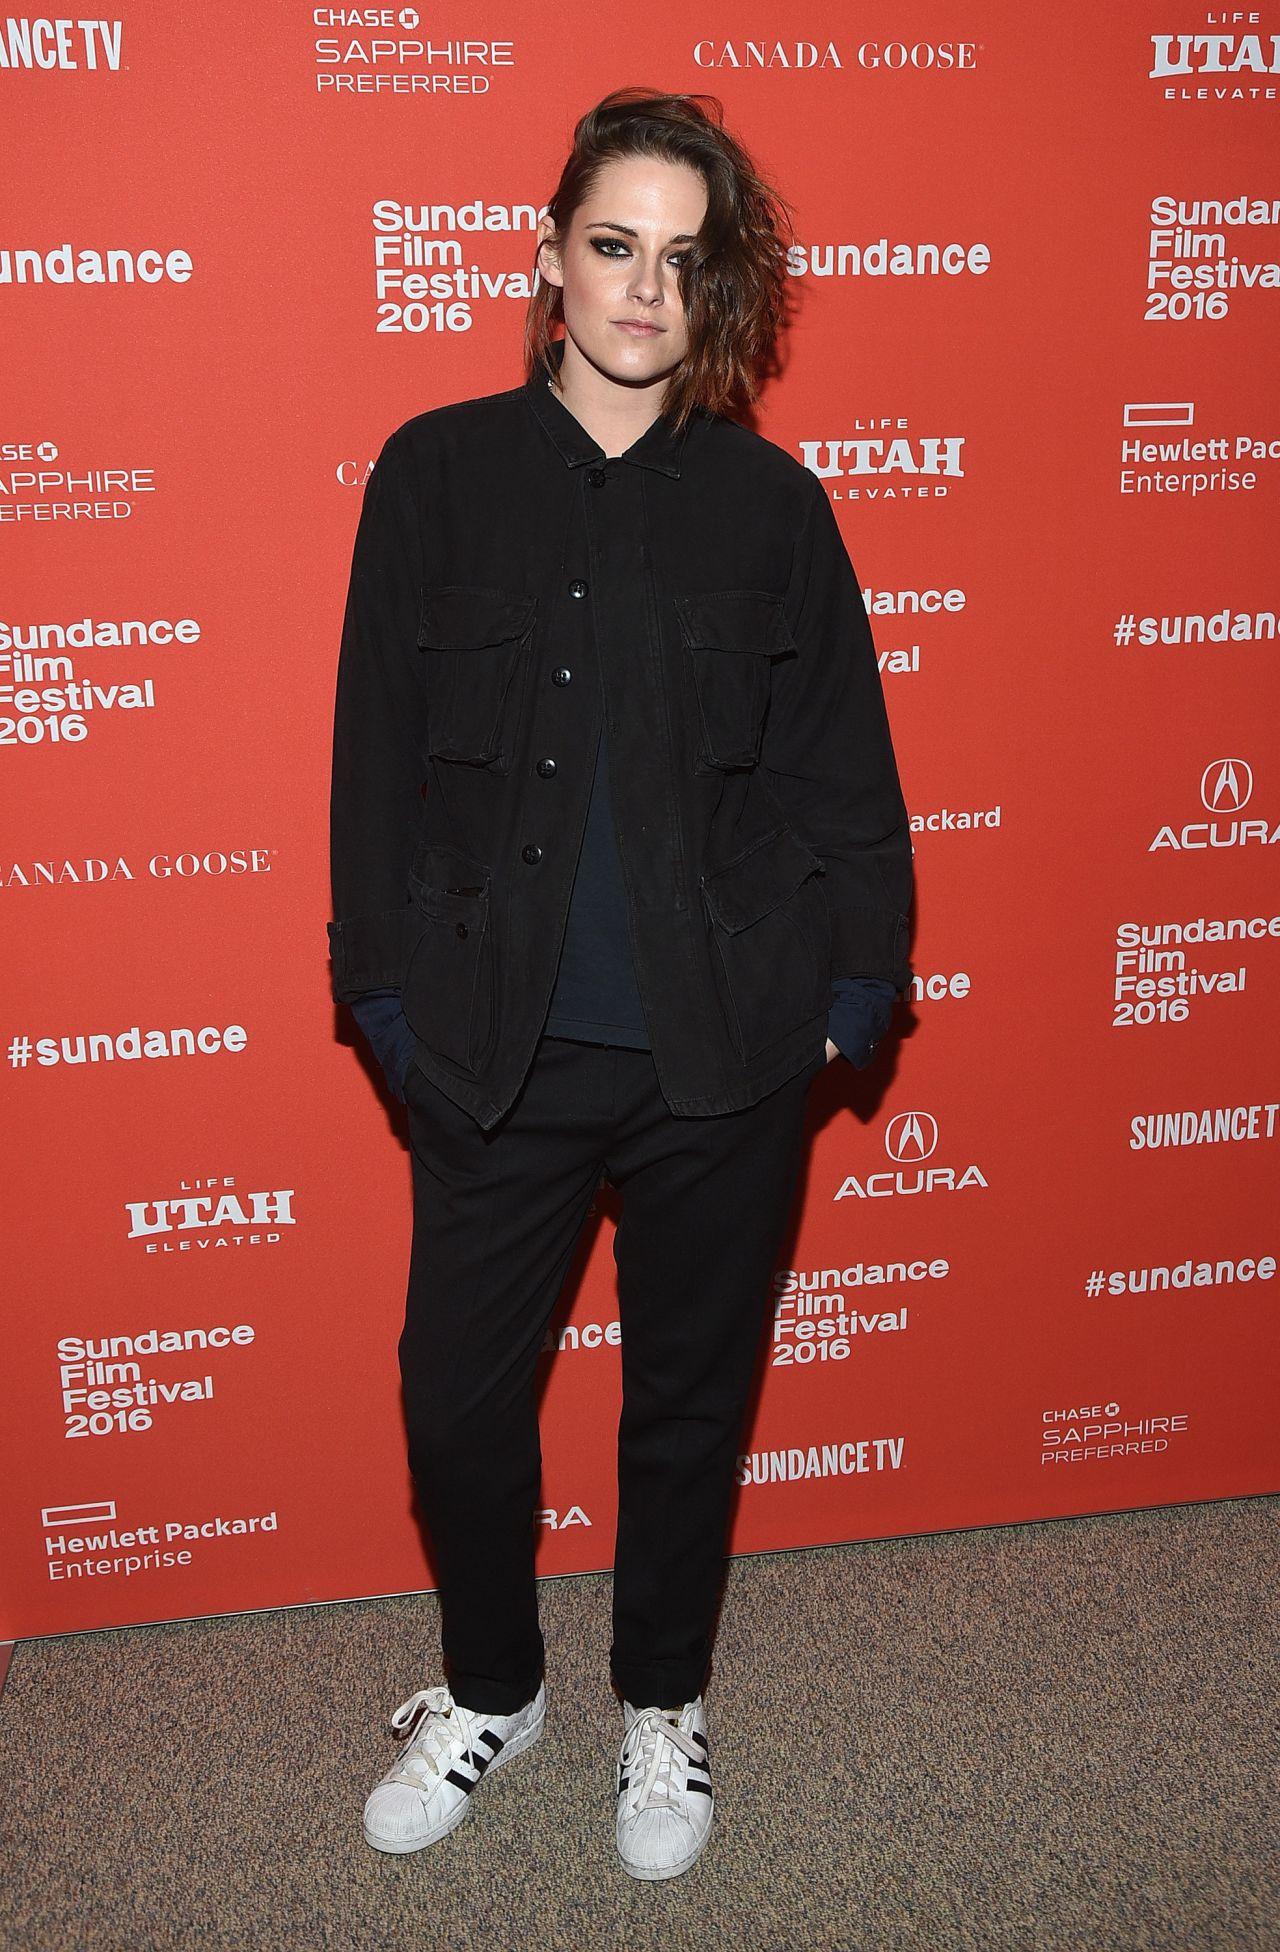 Stewart certain women at premiere sundance film festival 2016